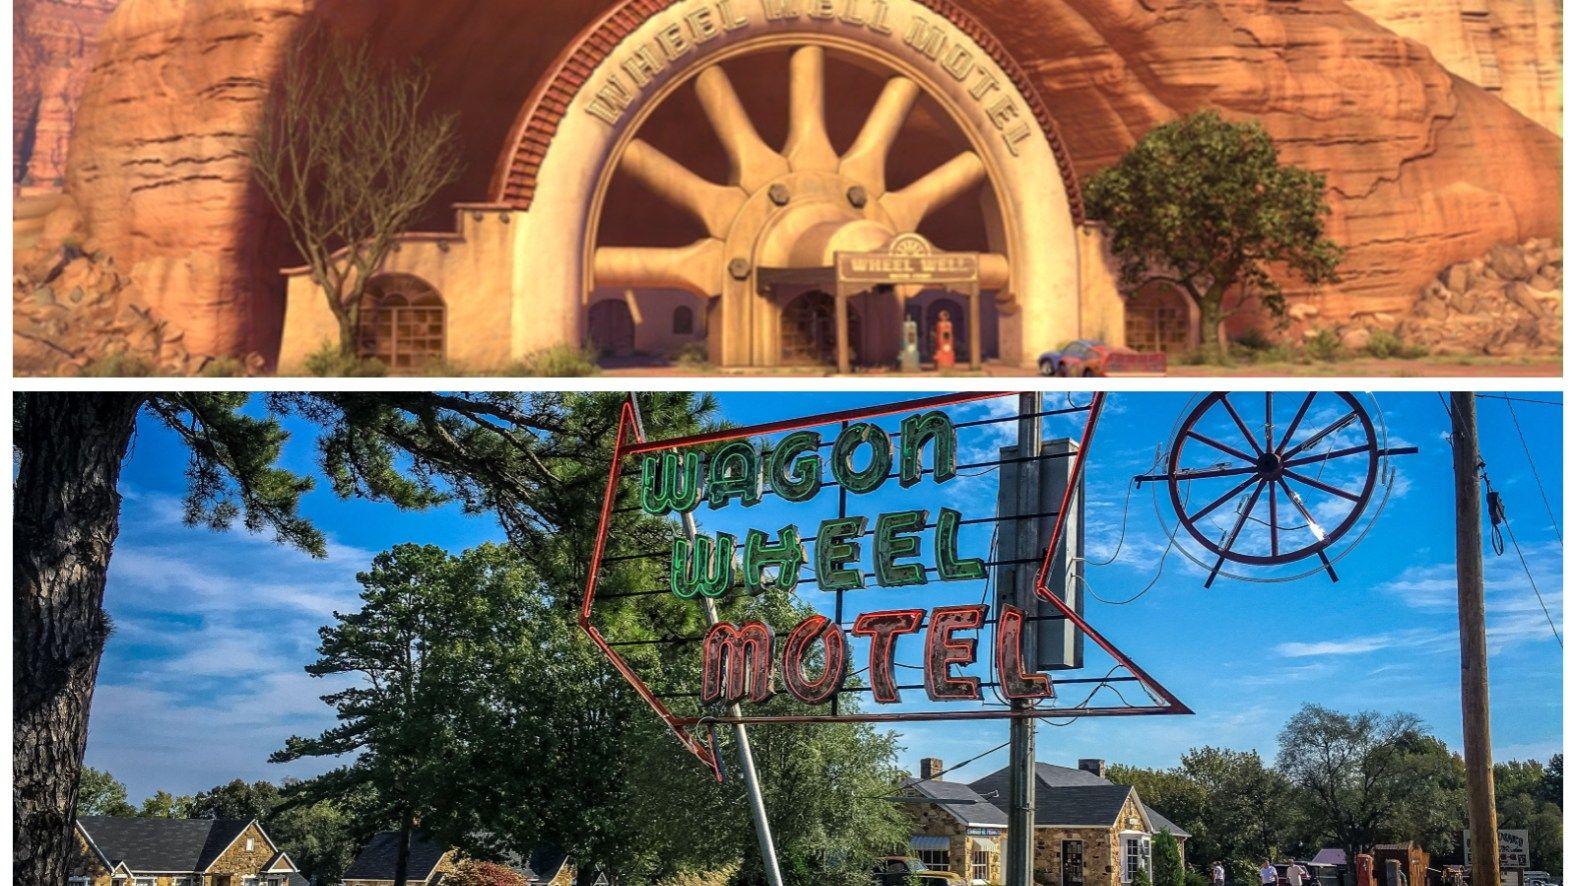 "<img src=""cars-wheel-well.jpg"" alt=""Wheel Well Motel and Wagon Wheel Motel"">"